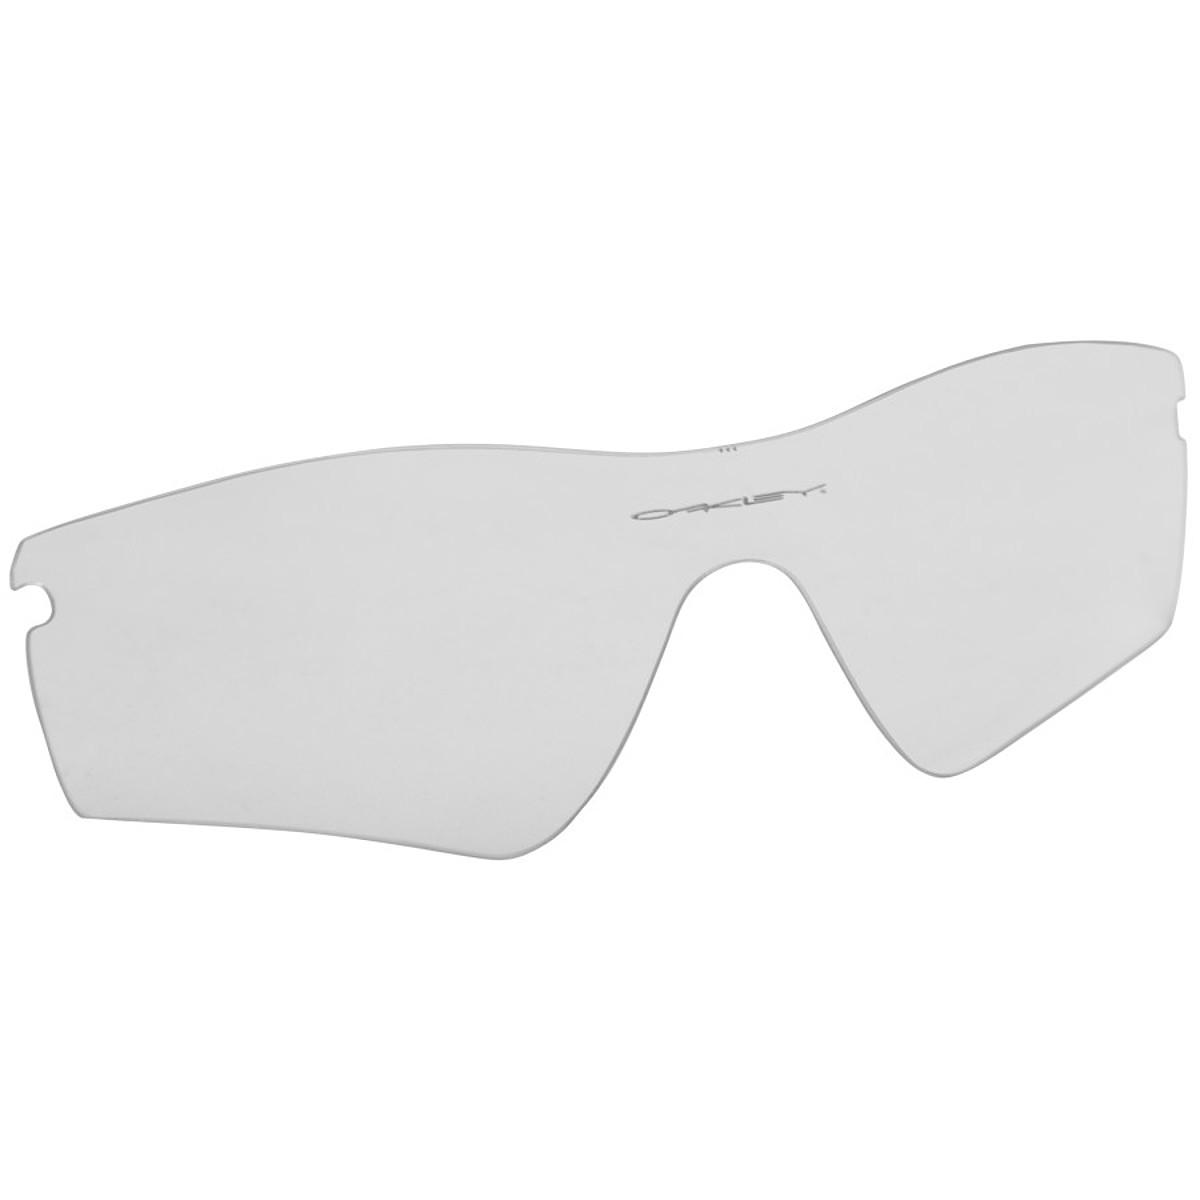 photo: Oakley Radar Path Accessory Lenses sunglass lens